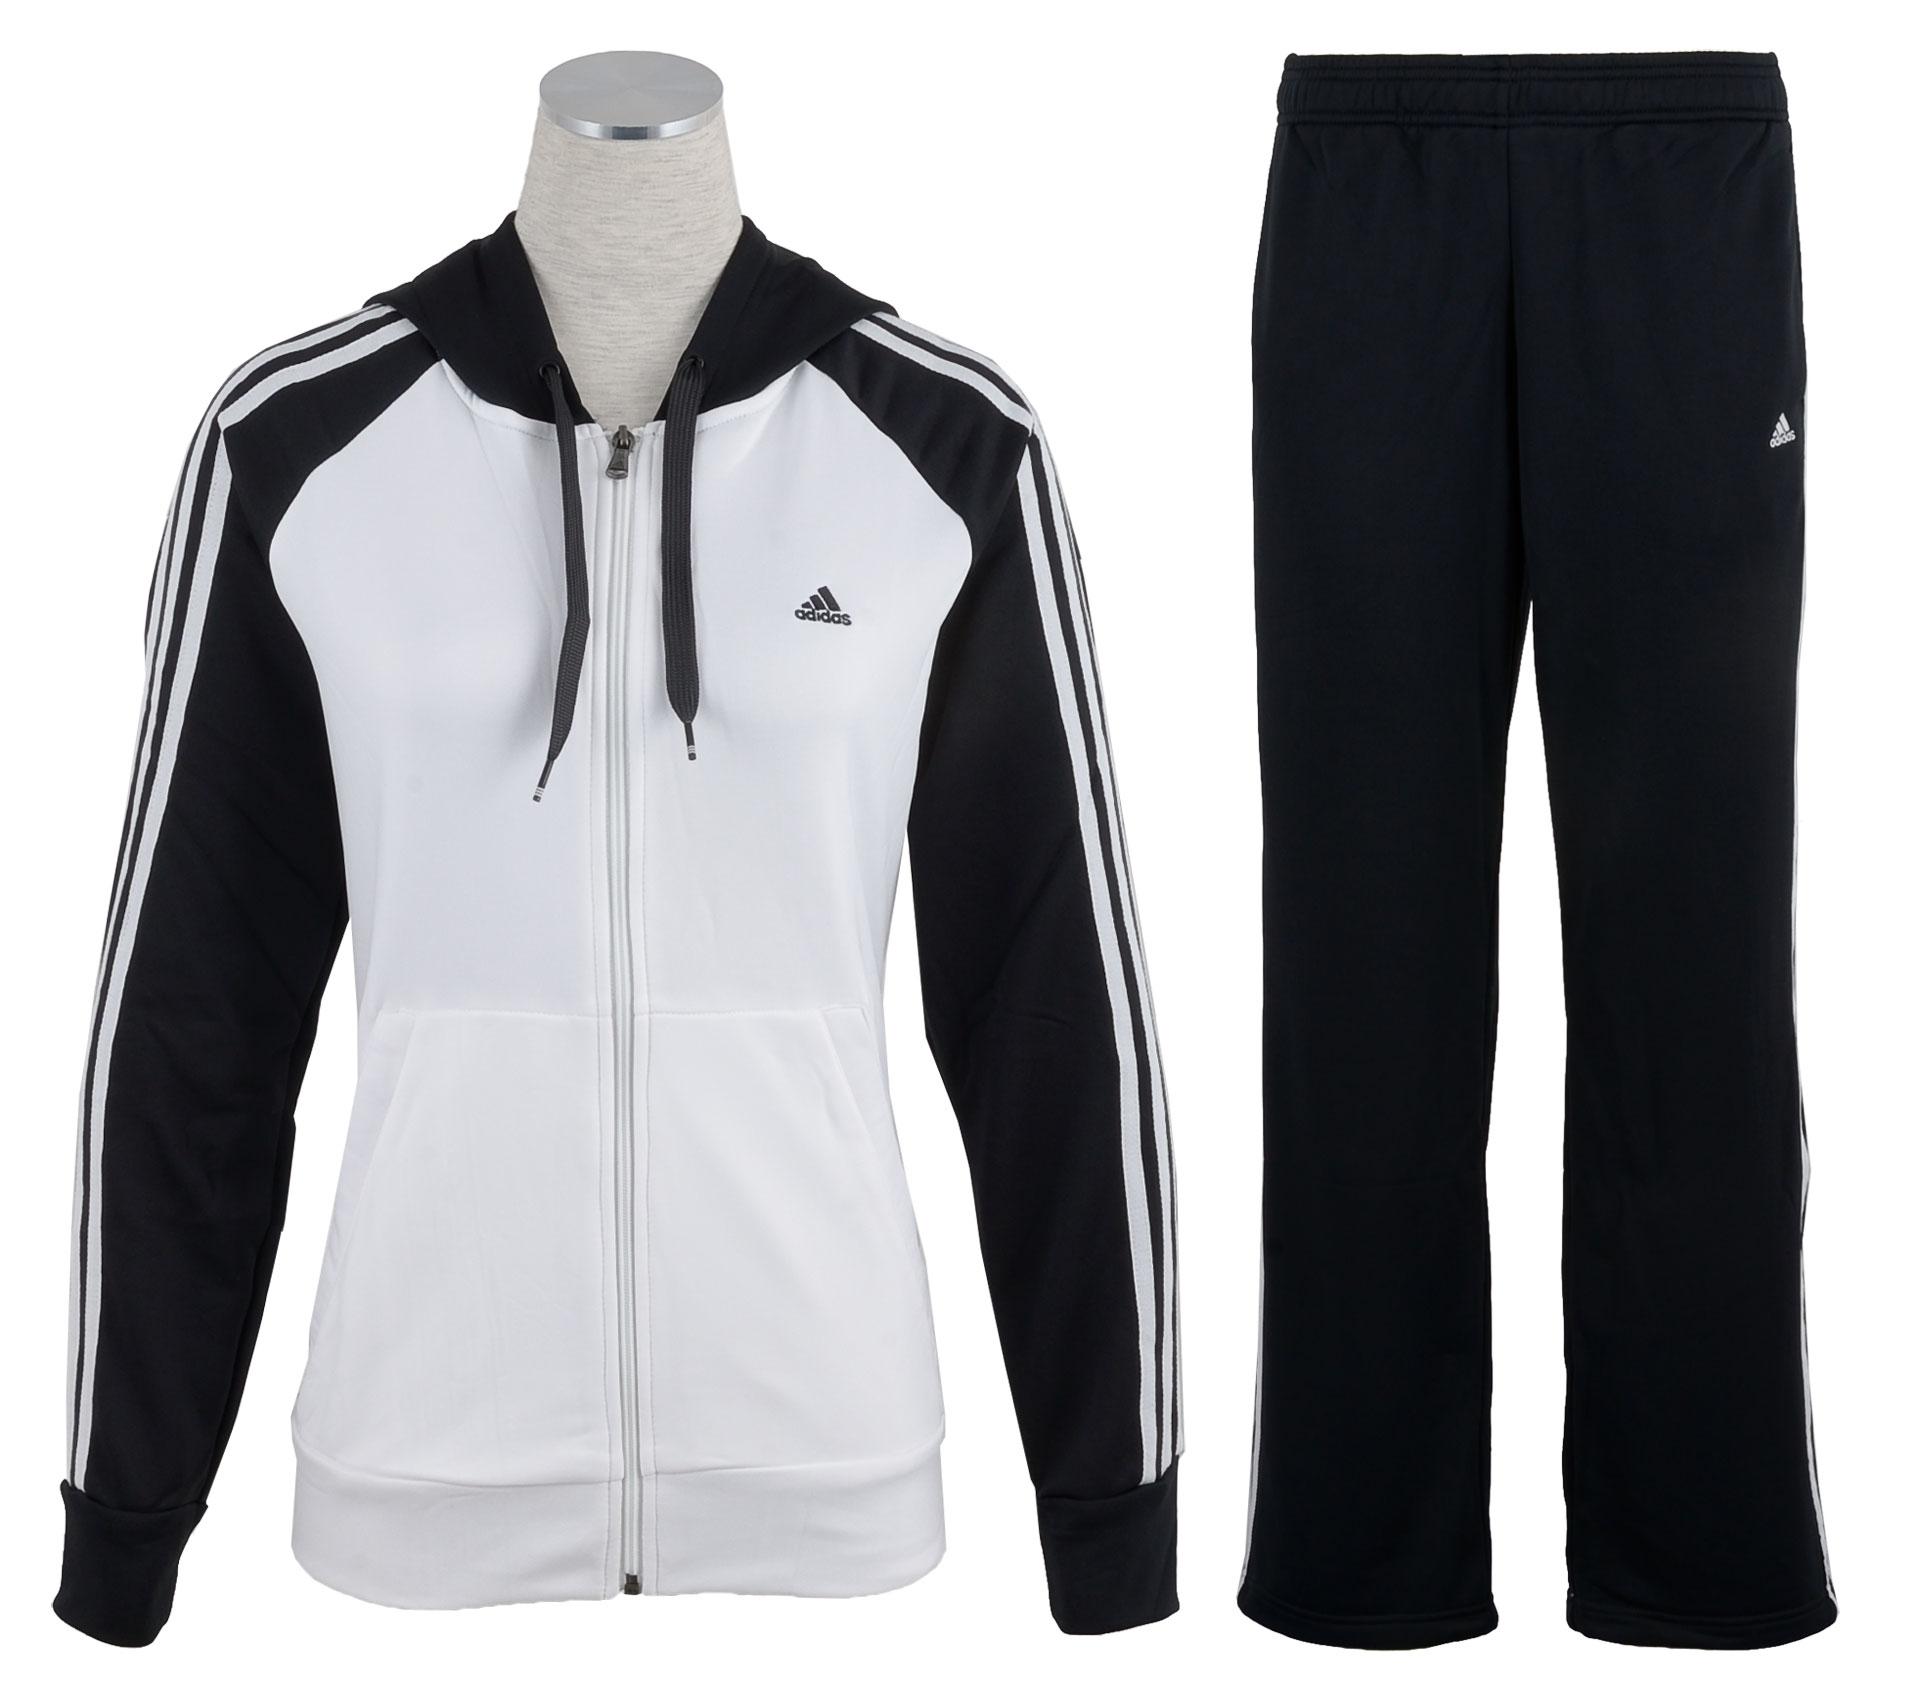 Adidas Young Knit Trainingspak D... laagste prijs? Vergelijk ...